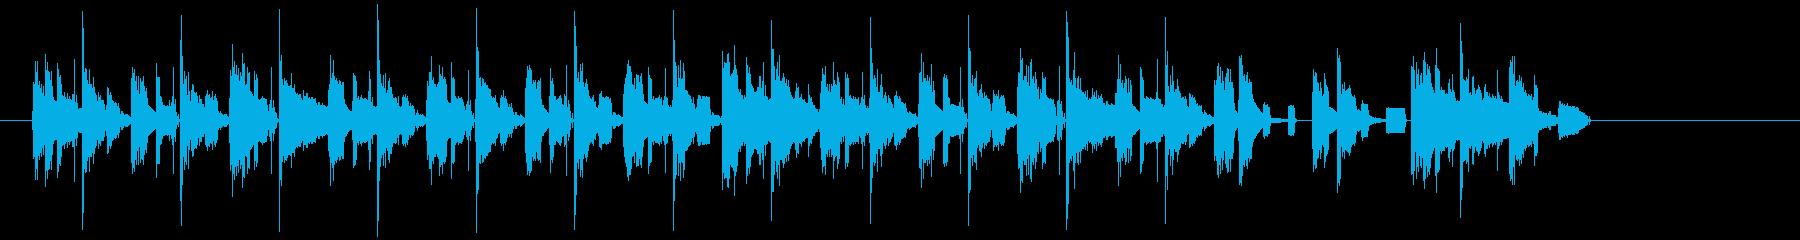 8bitのコミカルなジングルの再生済みの波形